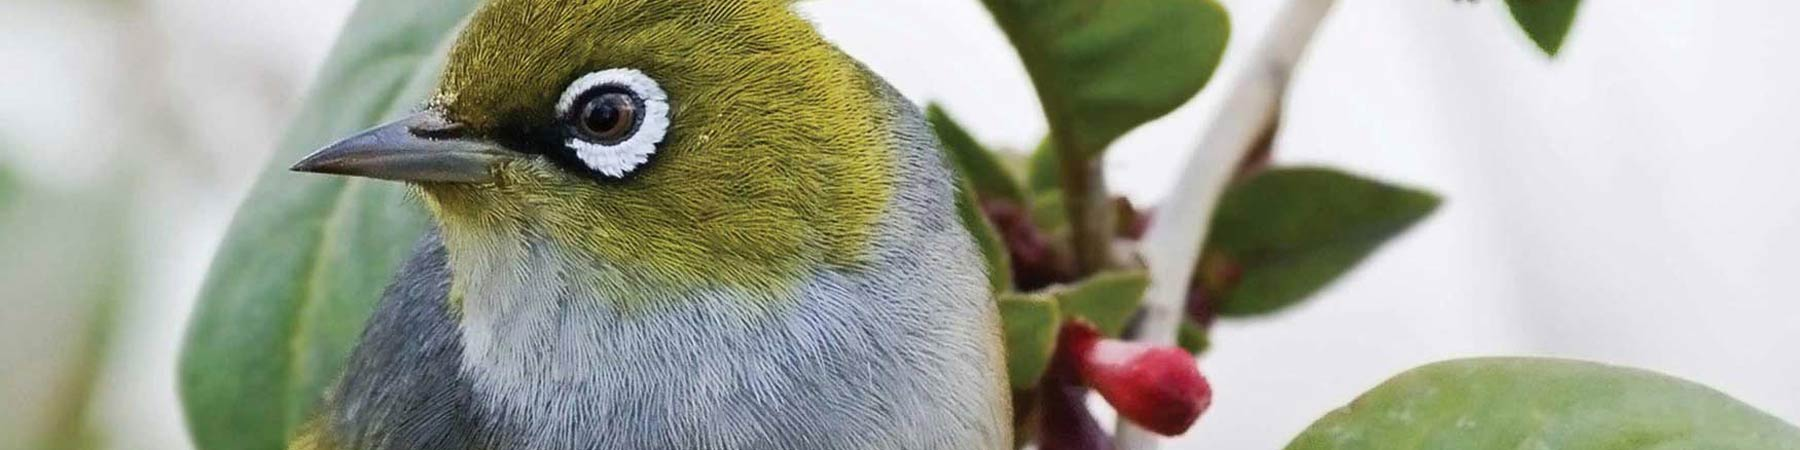 silvereye-bird-banner-3000